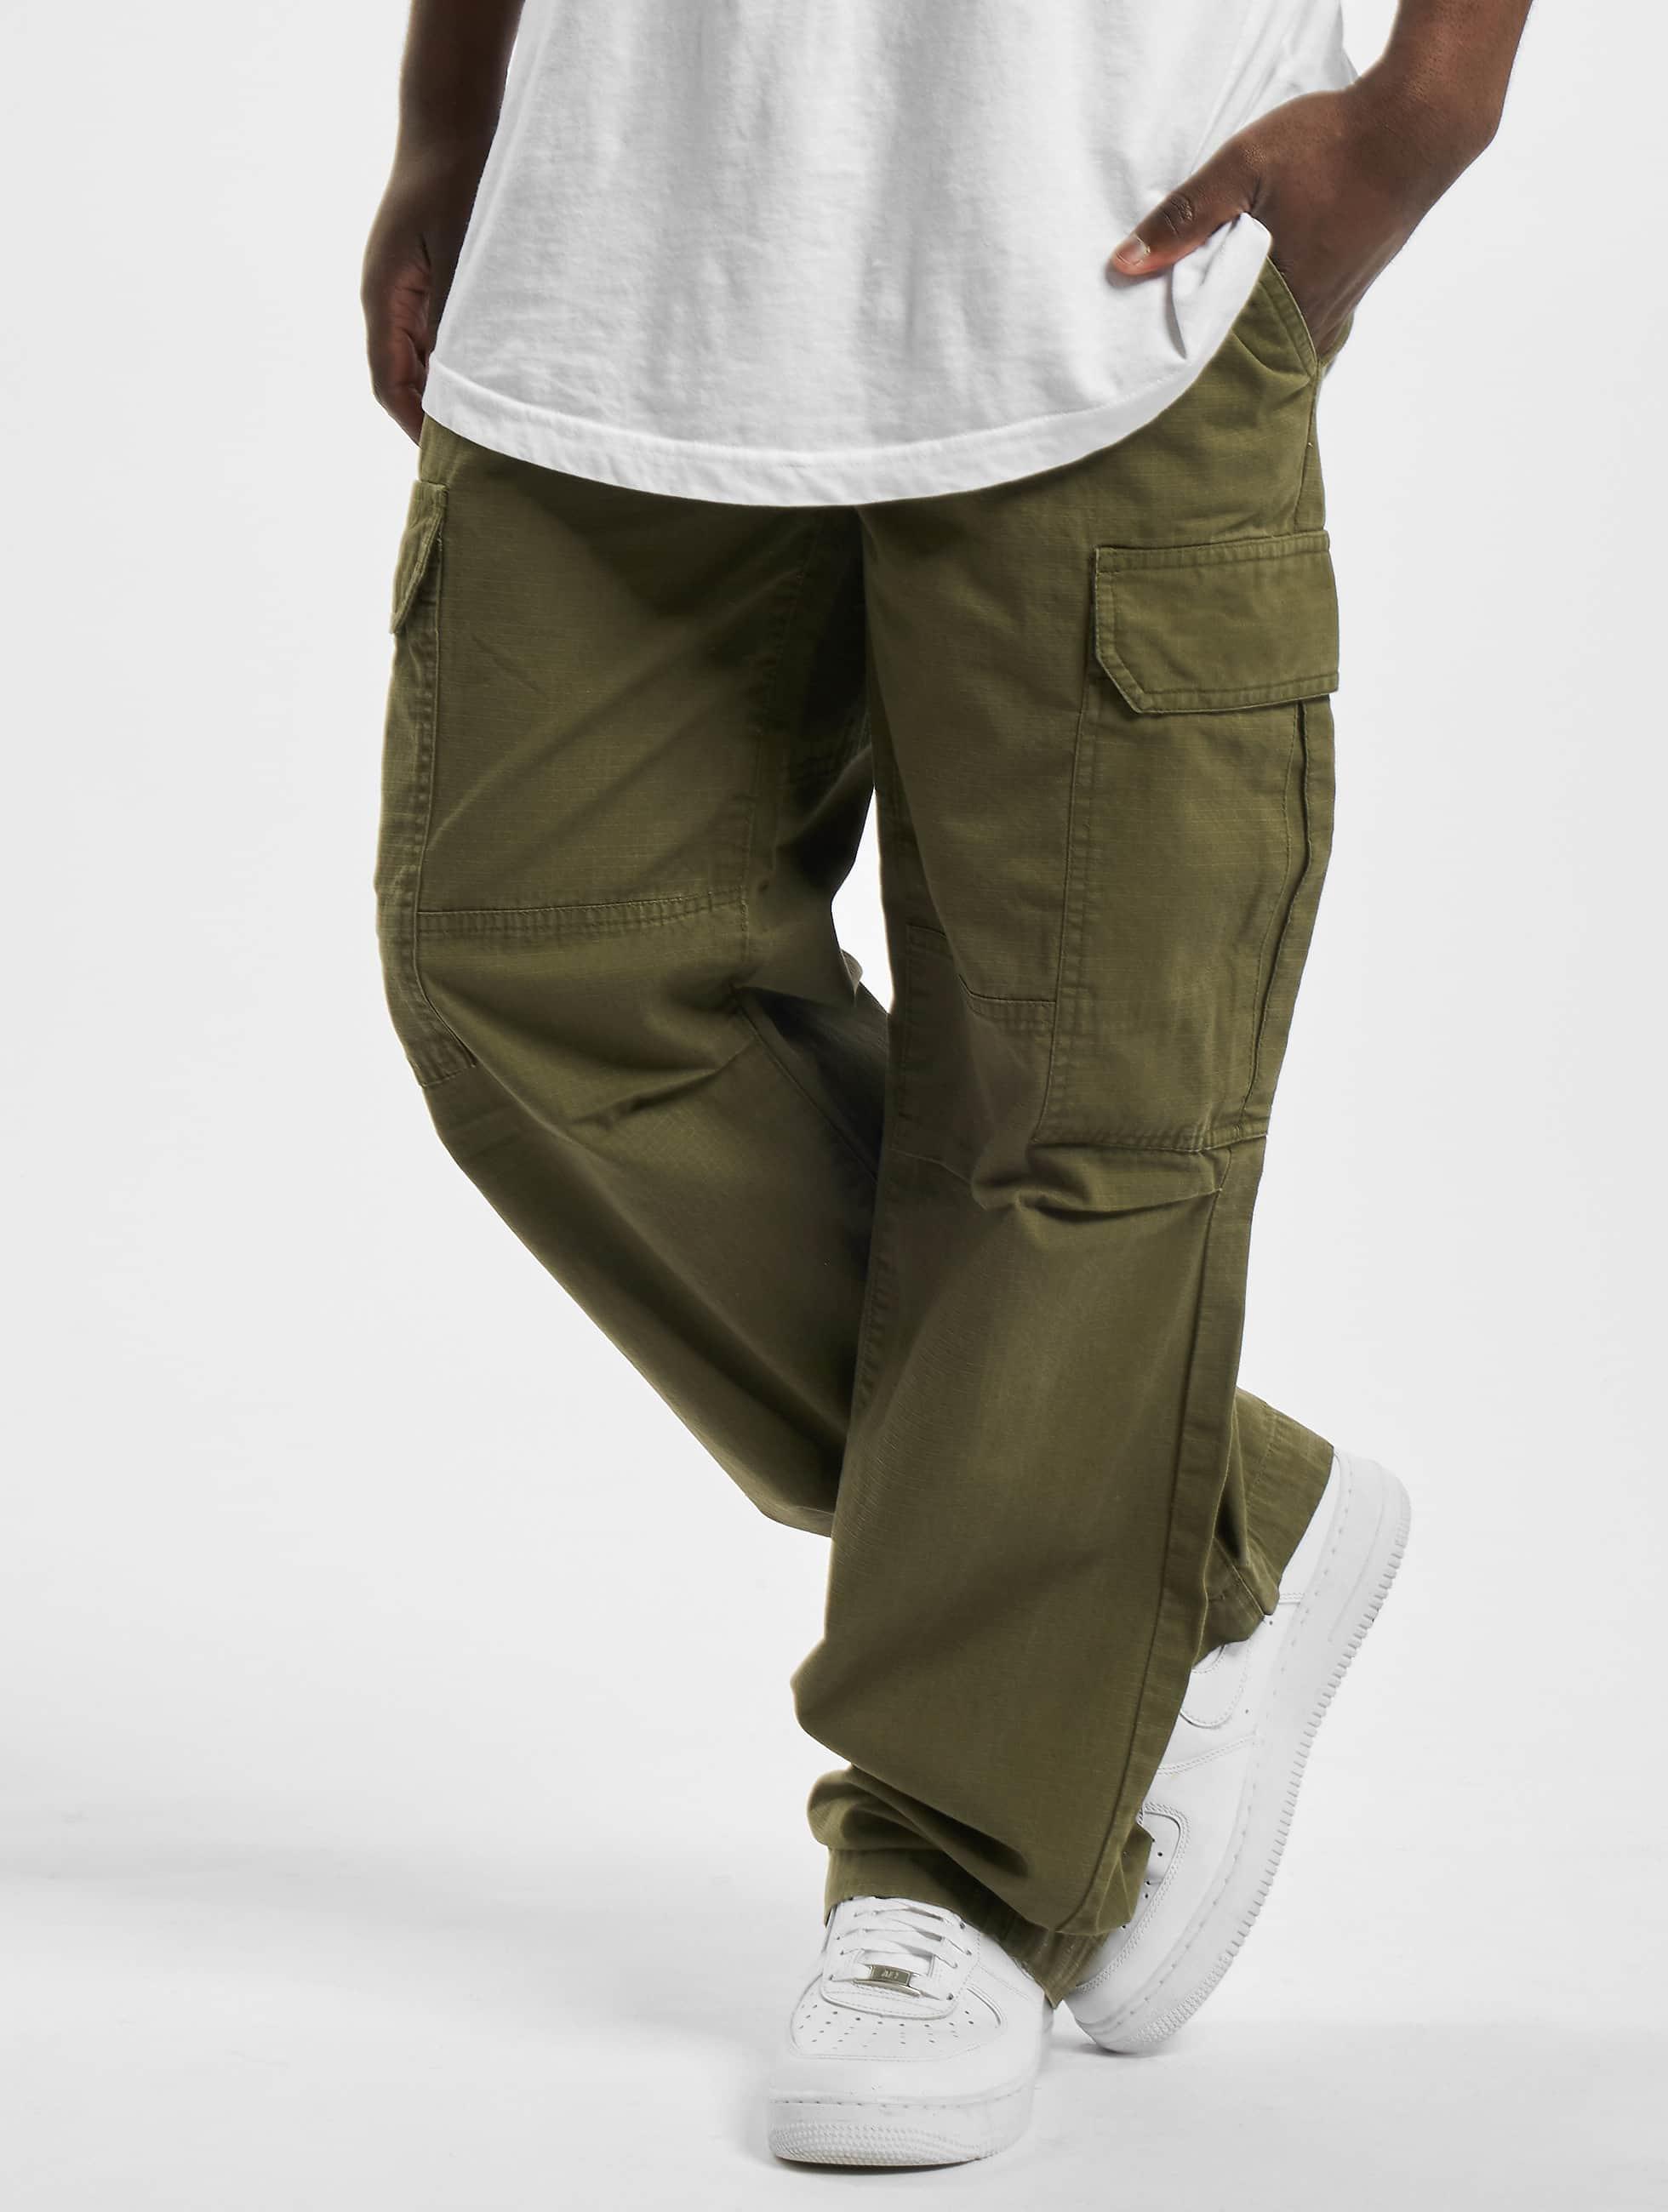 dickies new york olive homme pantalon cargo dickies acheter pas cher pantalon 131590. Black Bedroom Furniture Sets. Home Design Ideas